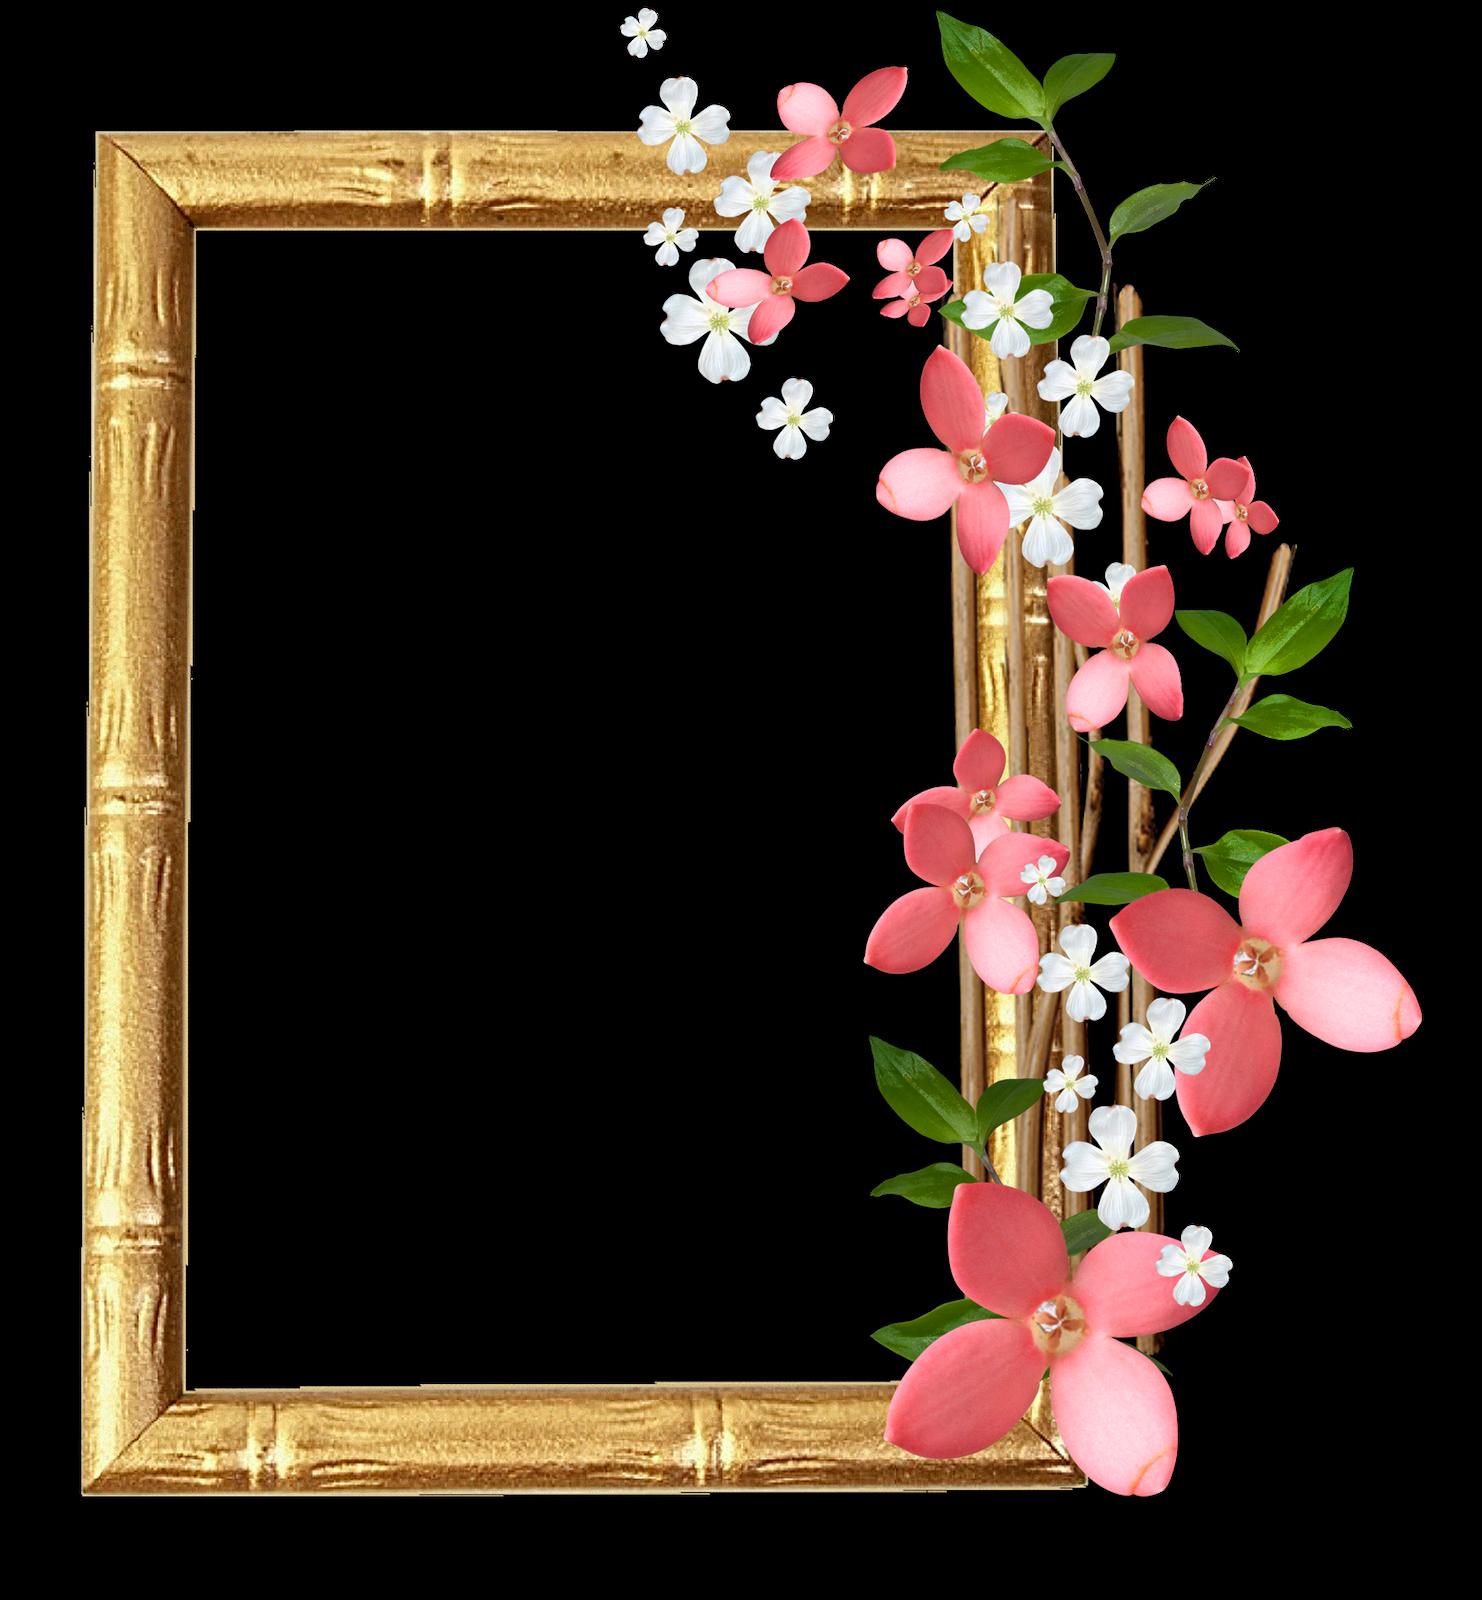 colecci n de gifs marcos para fotos de flores